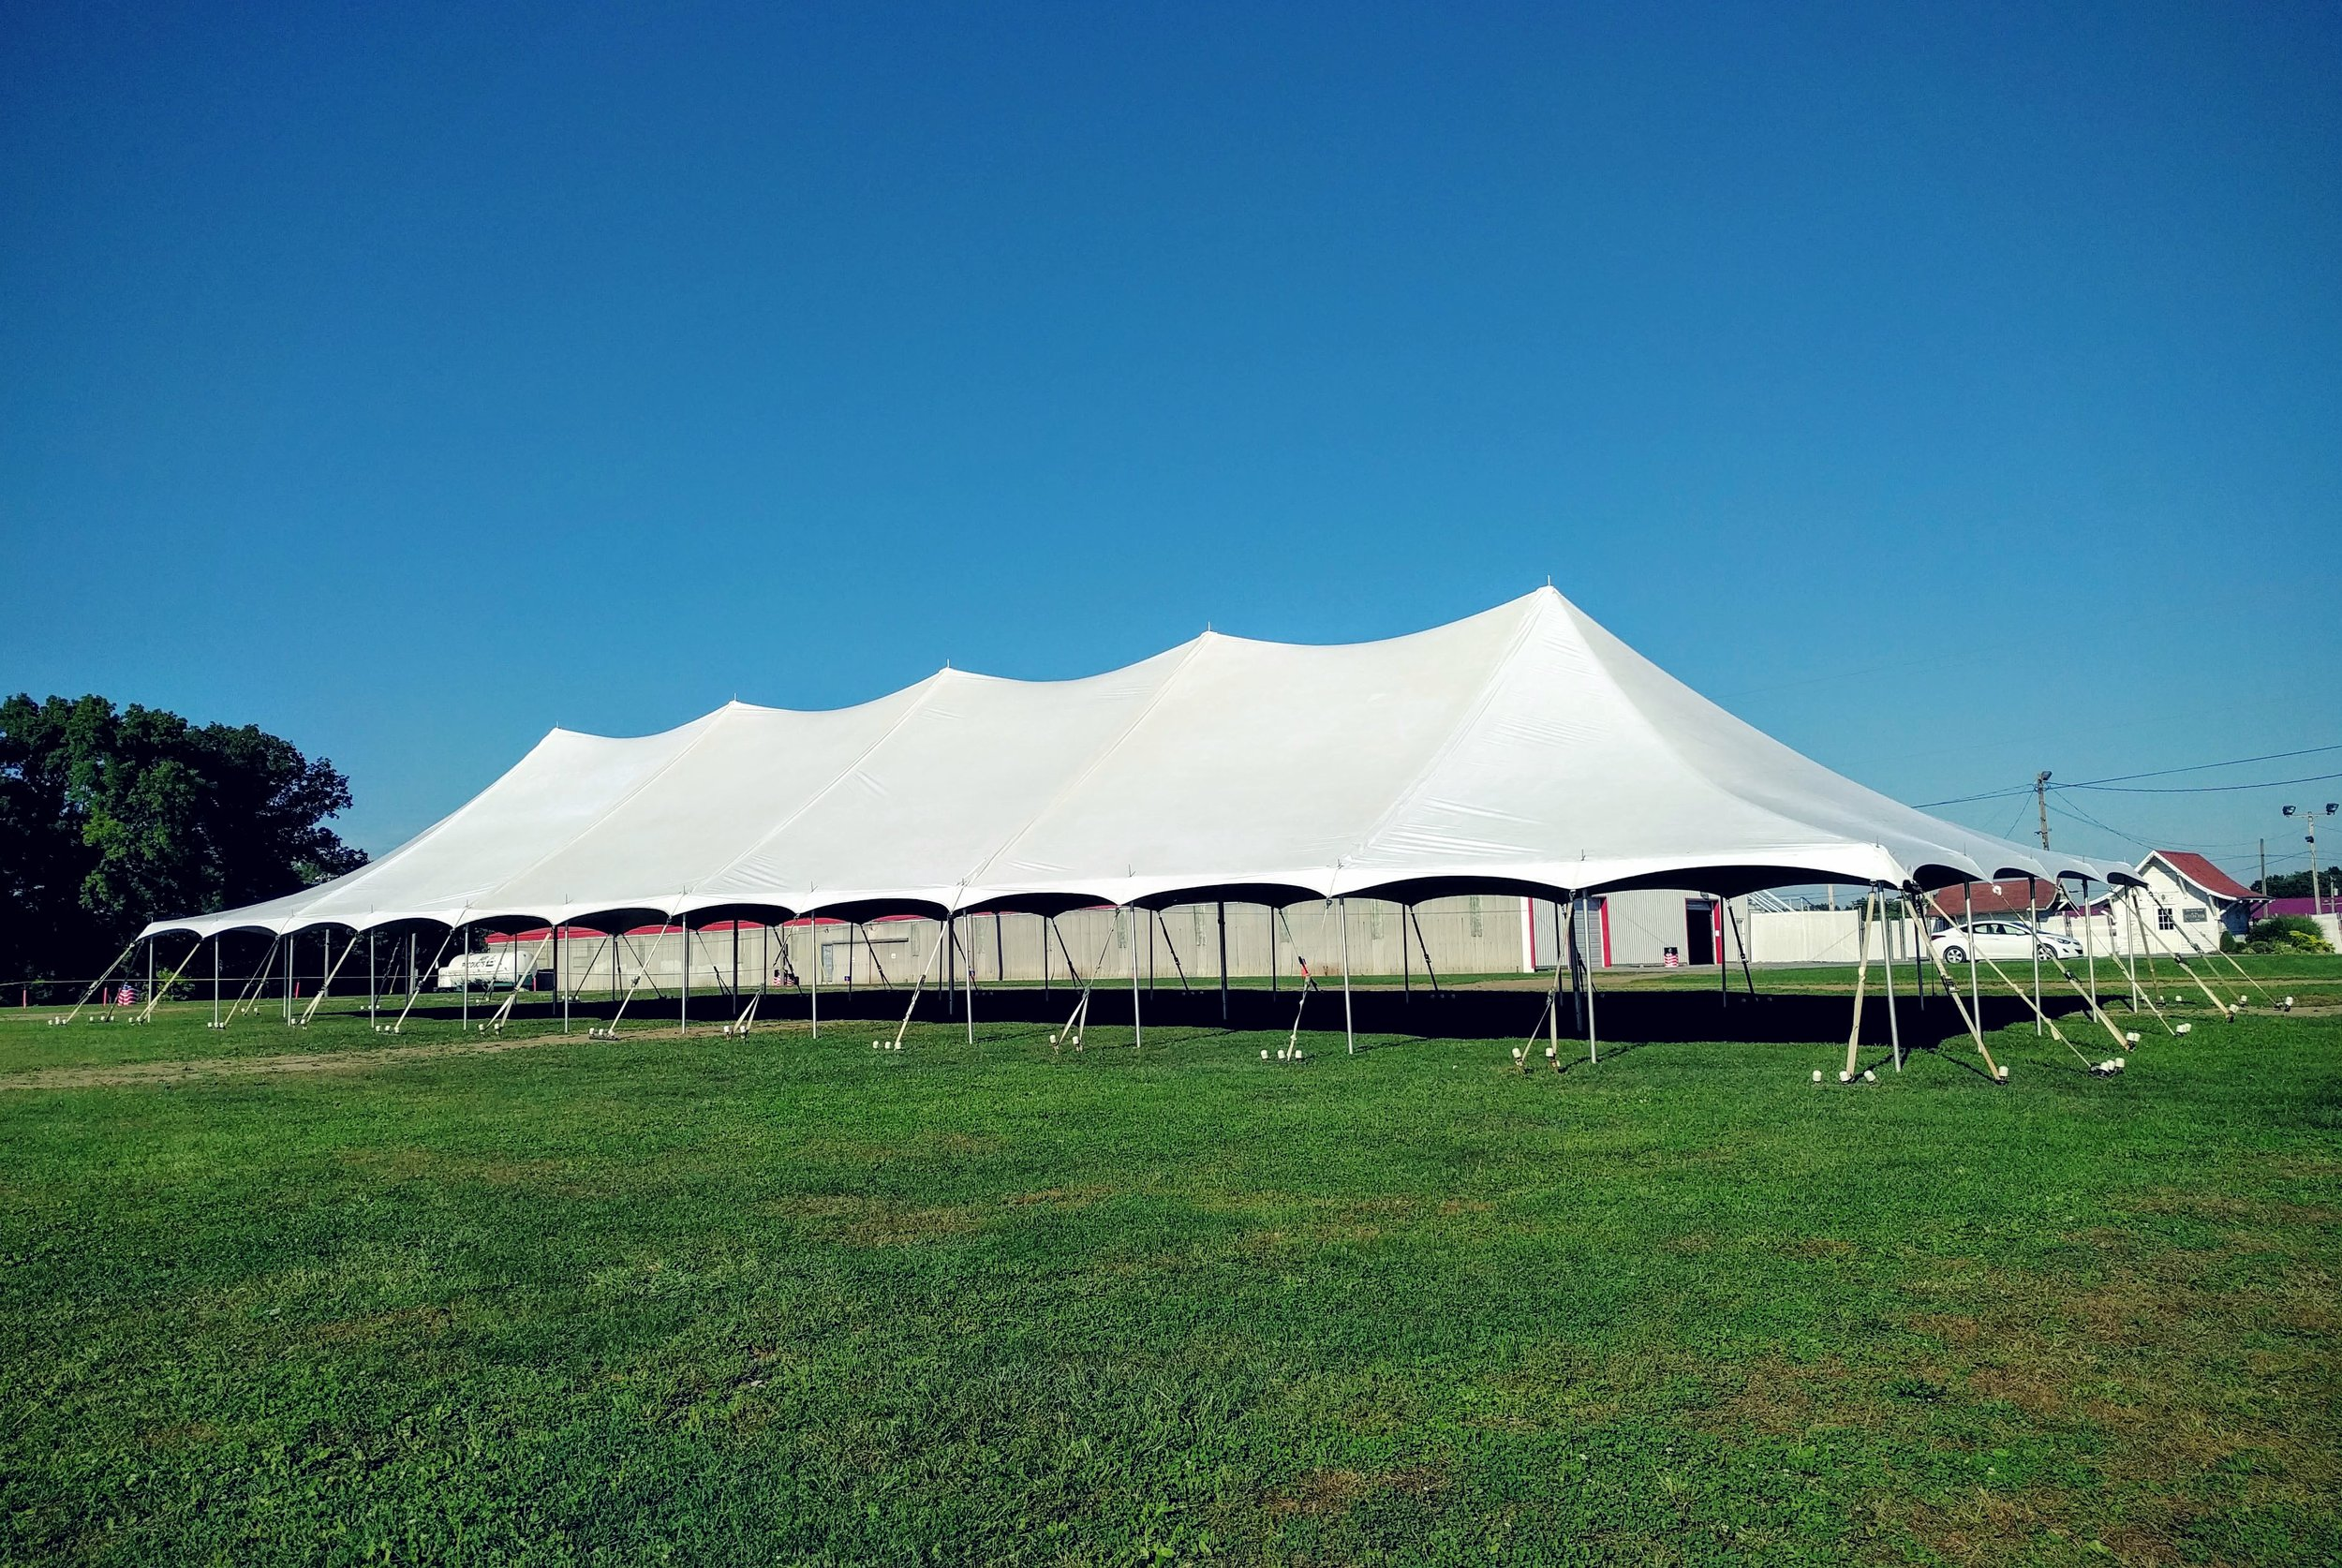 40' x 120' Large Pole Tent